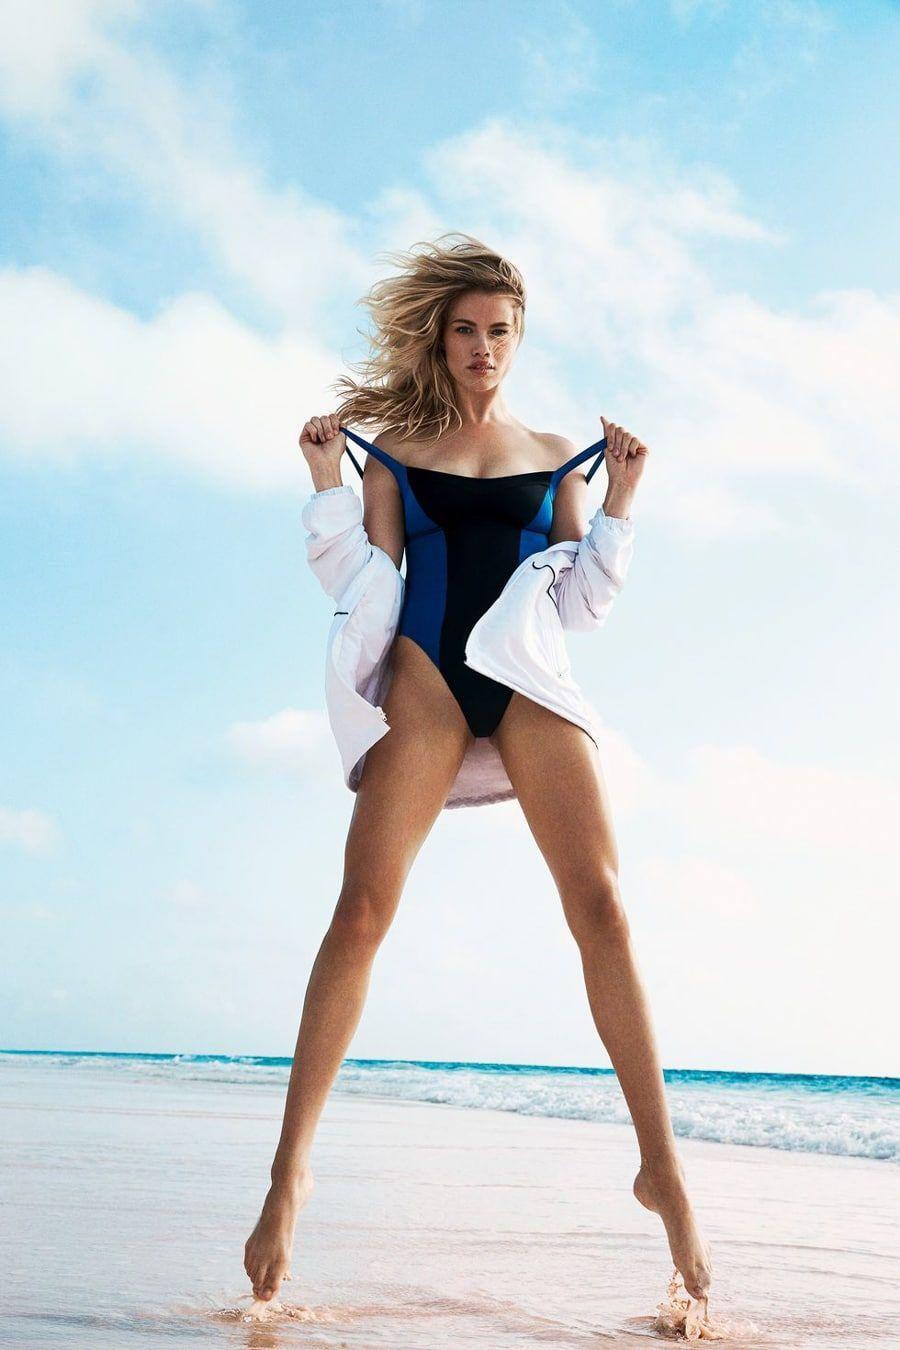 Inez Busty Awesome hailey clauson rocks beach season in si summer of swim   swimming